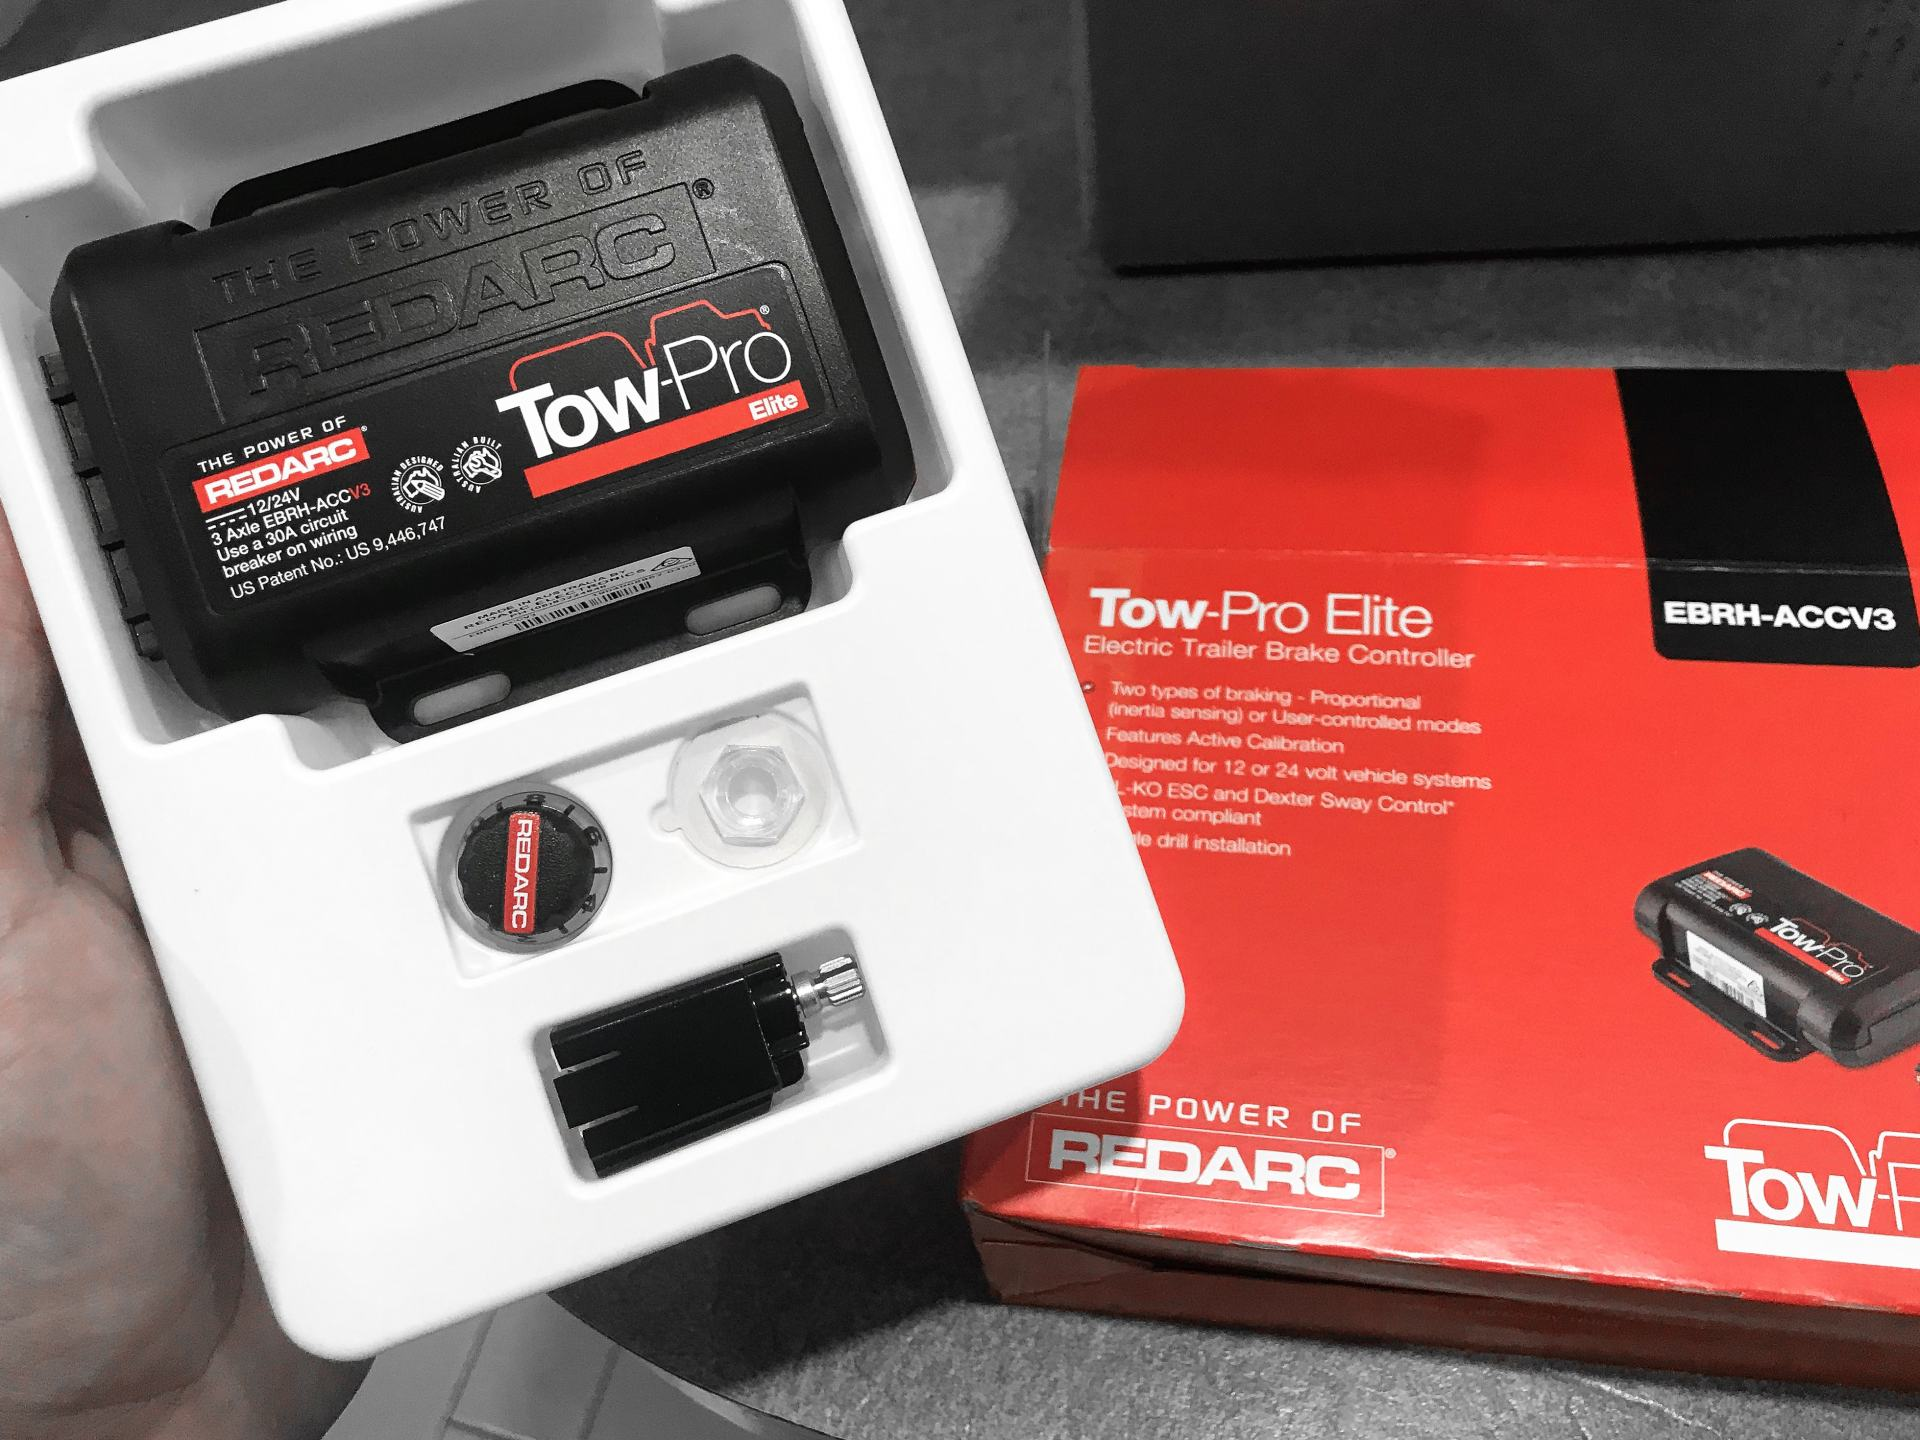 redarc tow-pro elite brake controller